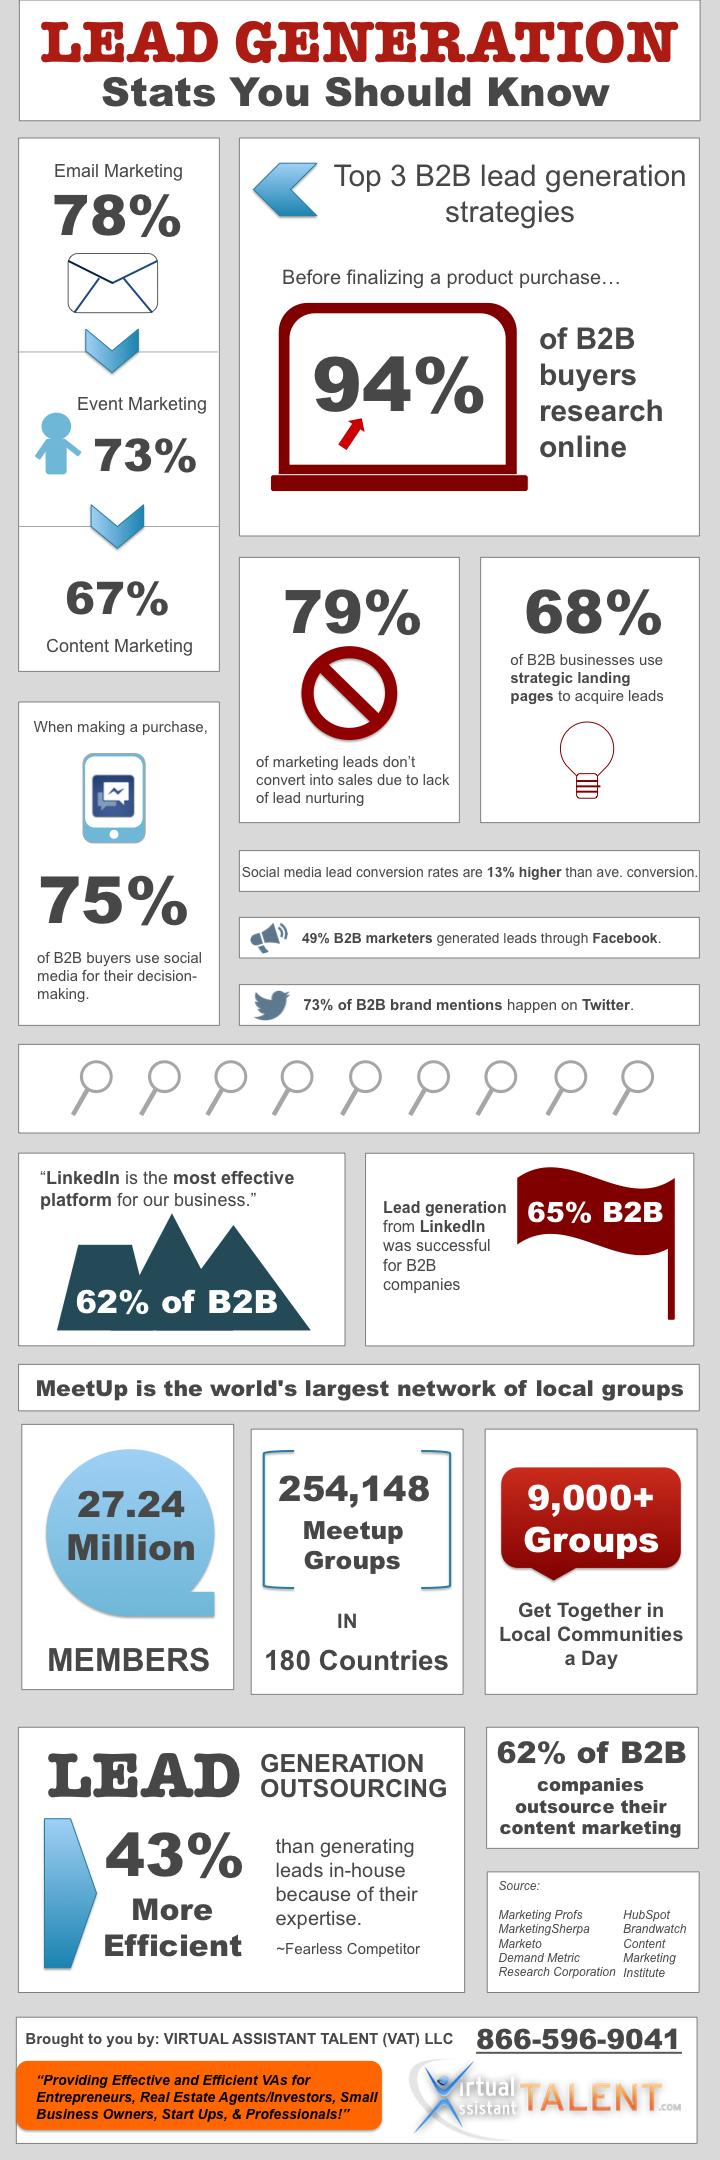 Online Lead Generation Statistics